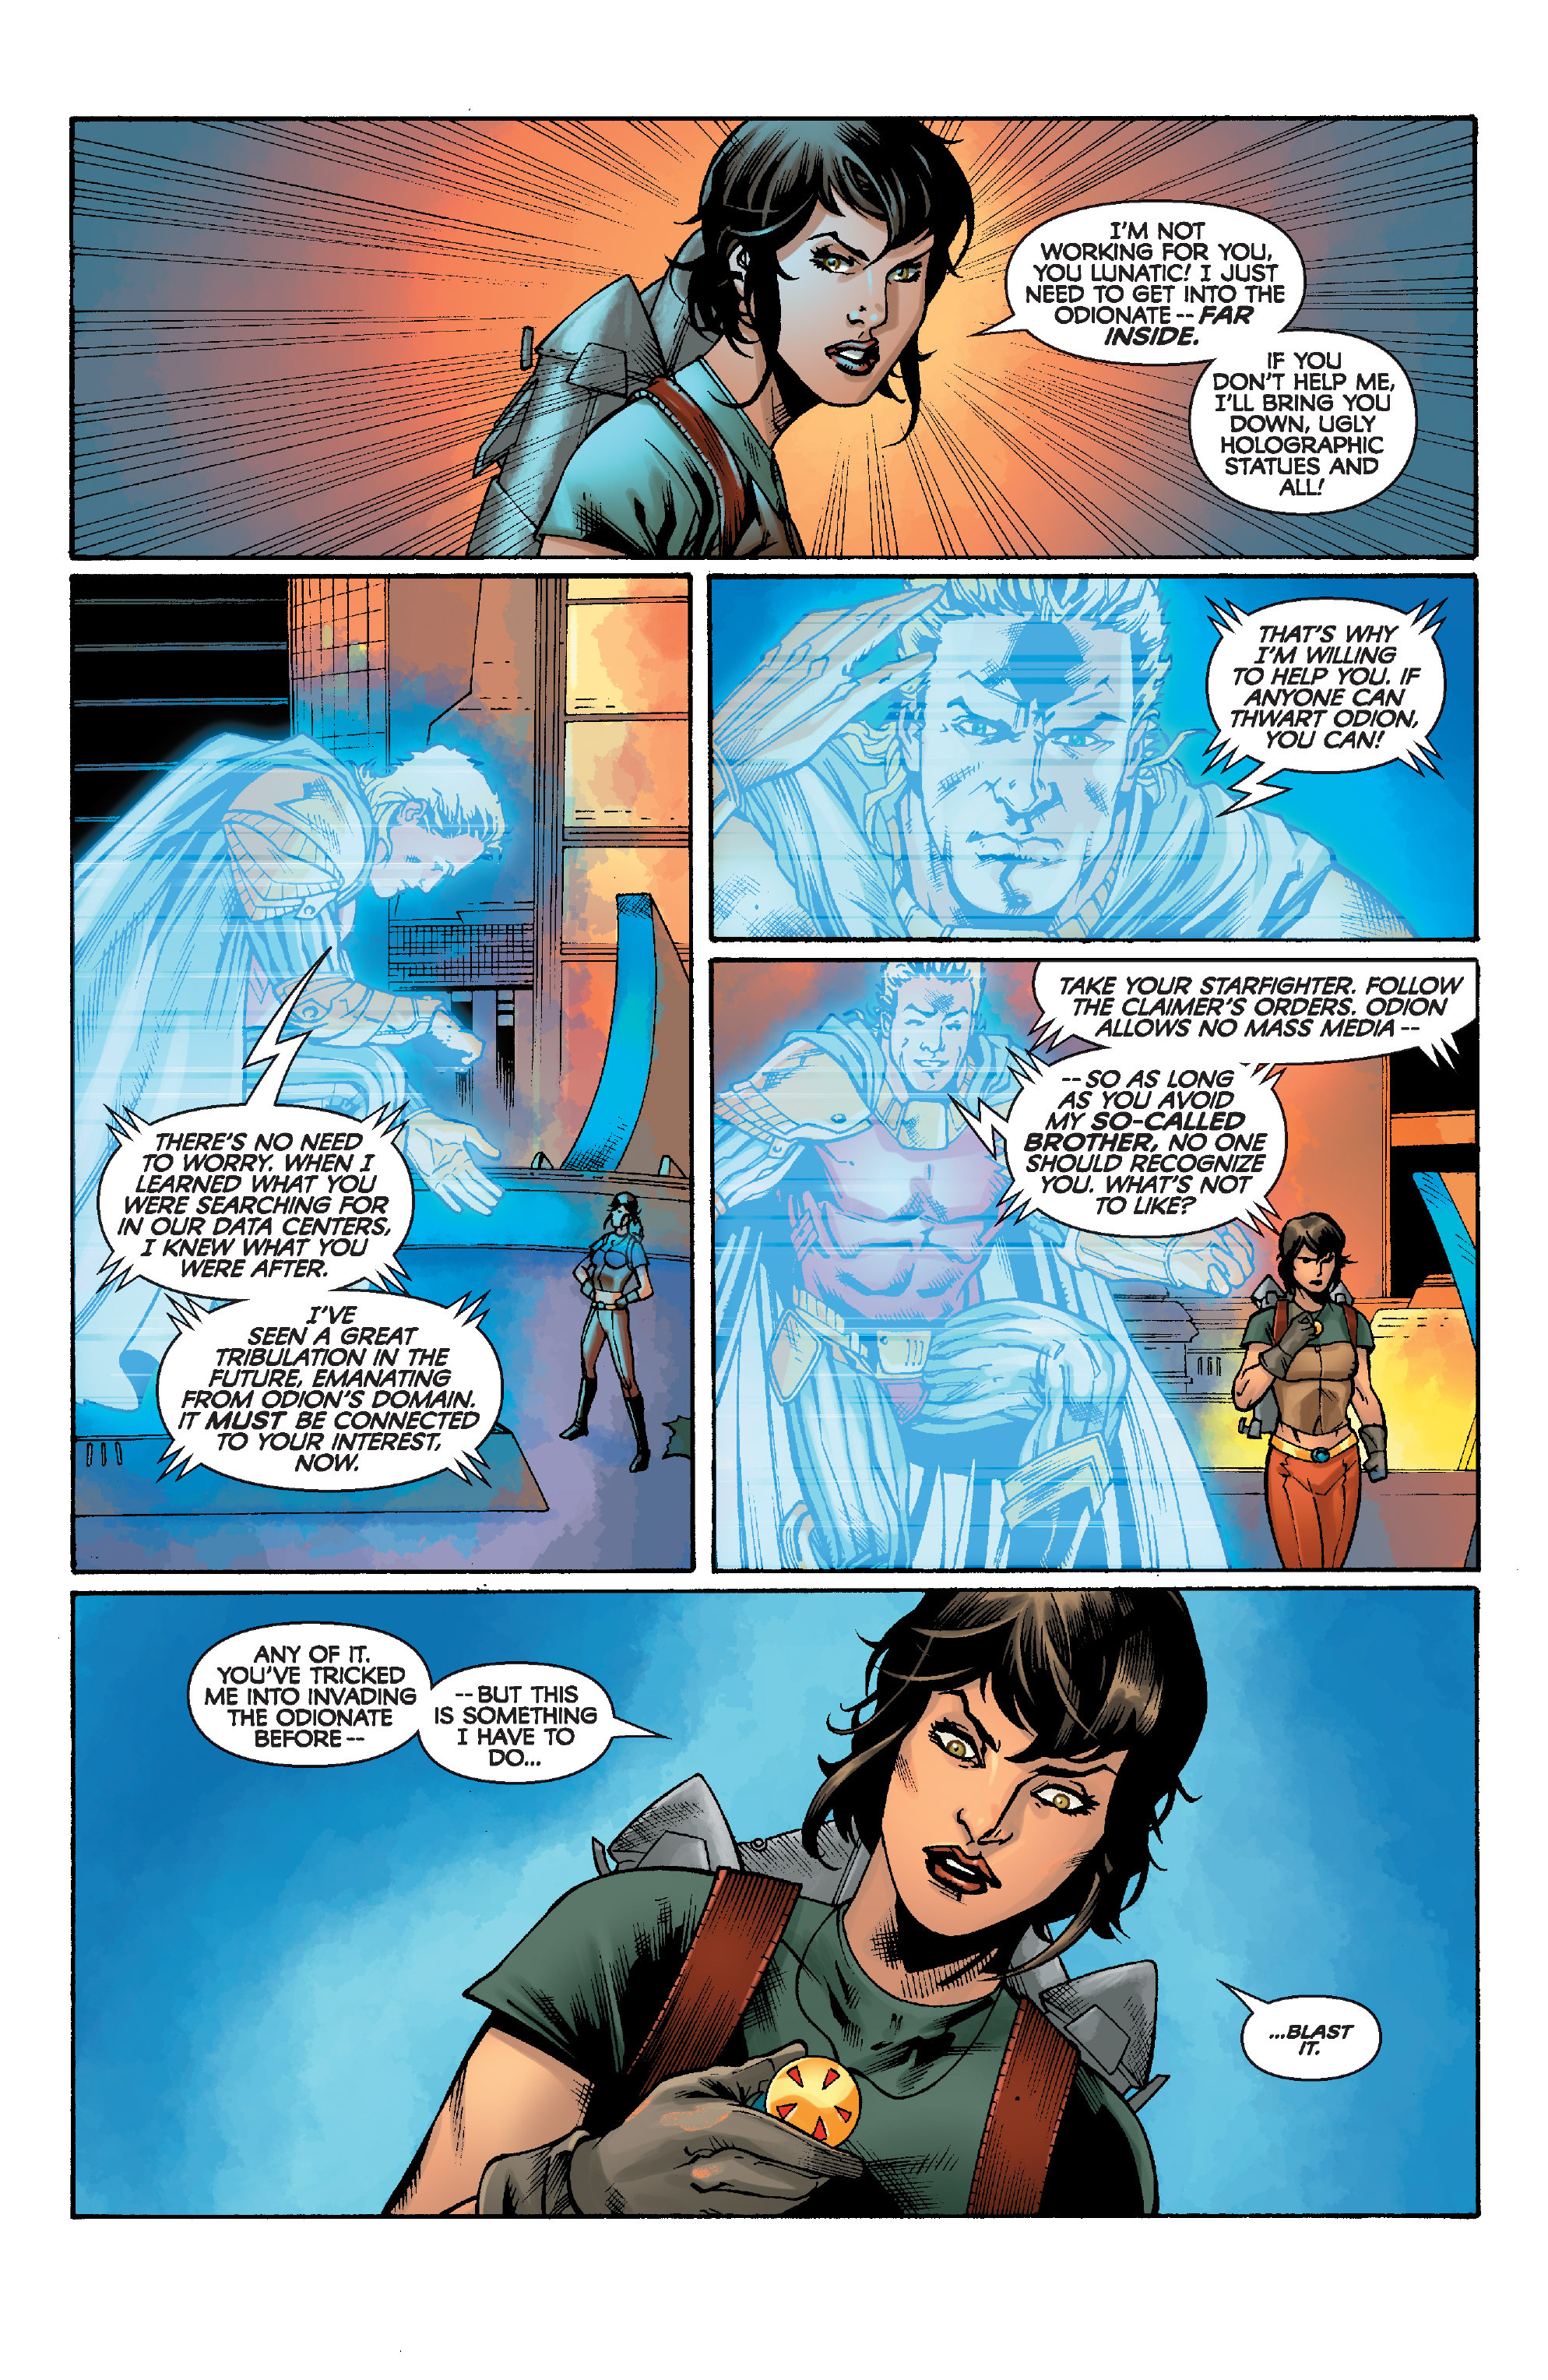 Read online Star Wars: Knight Errant - Escape comic -  Issue #1 - 9